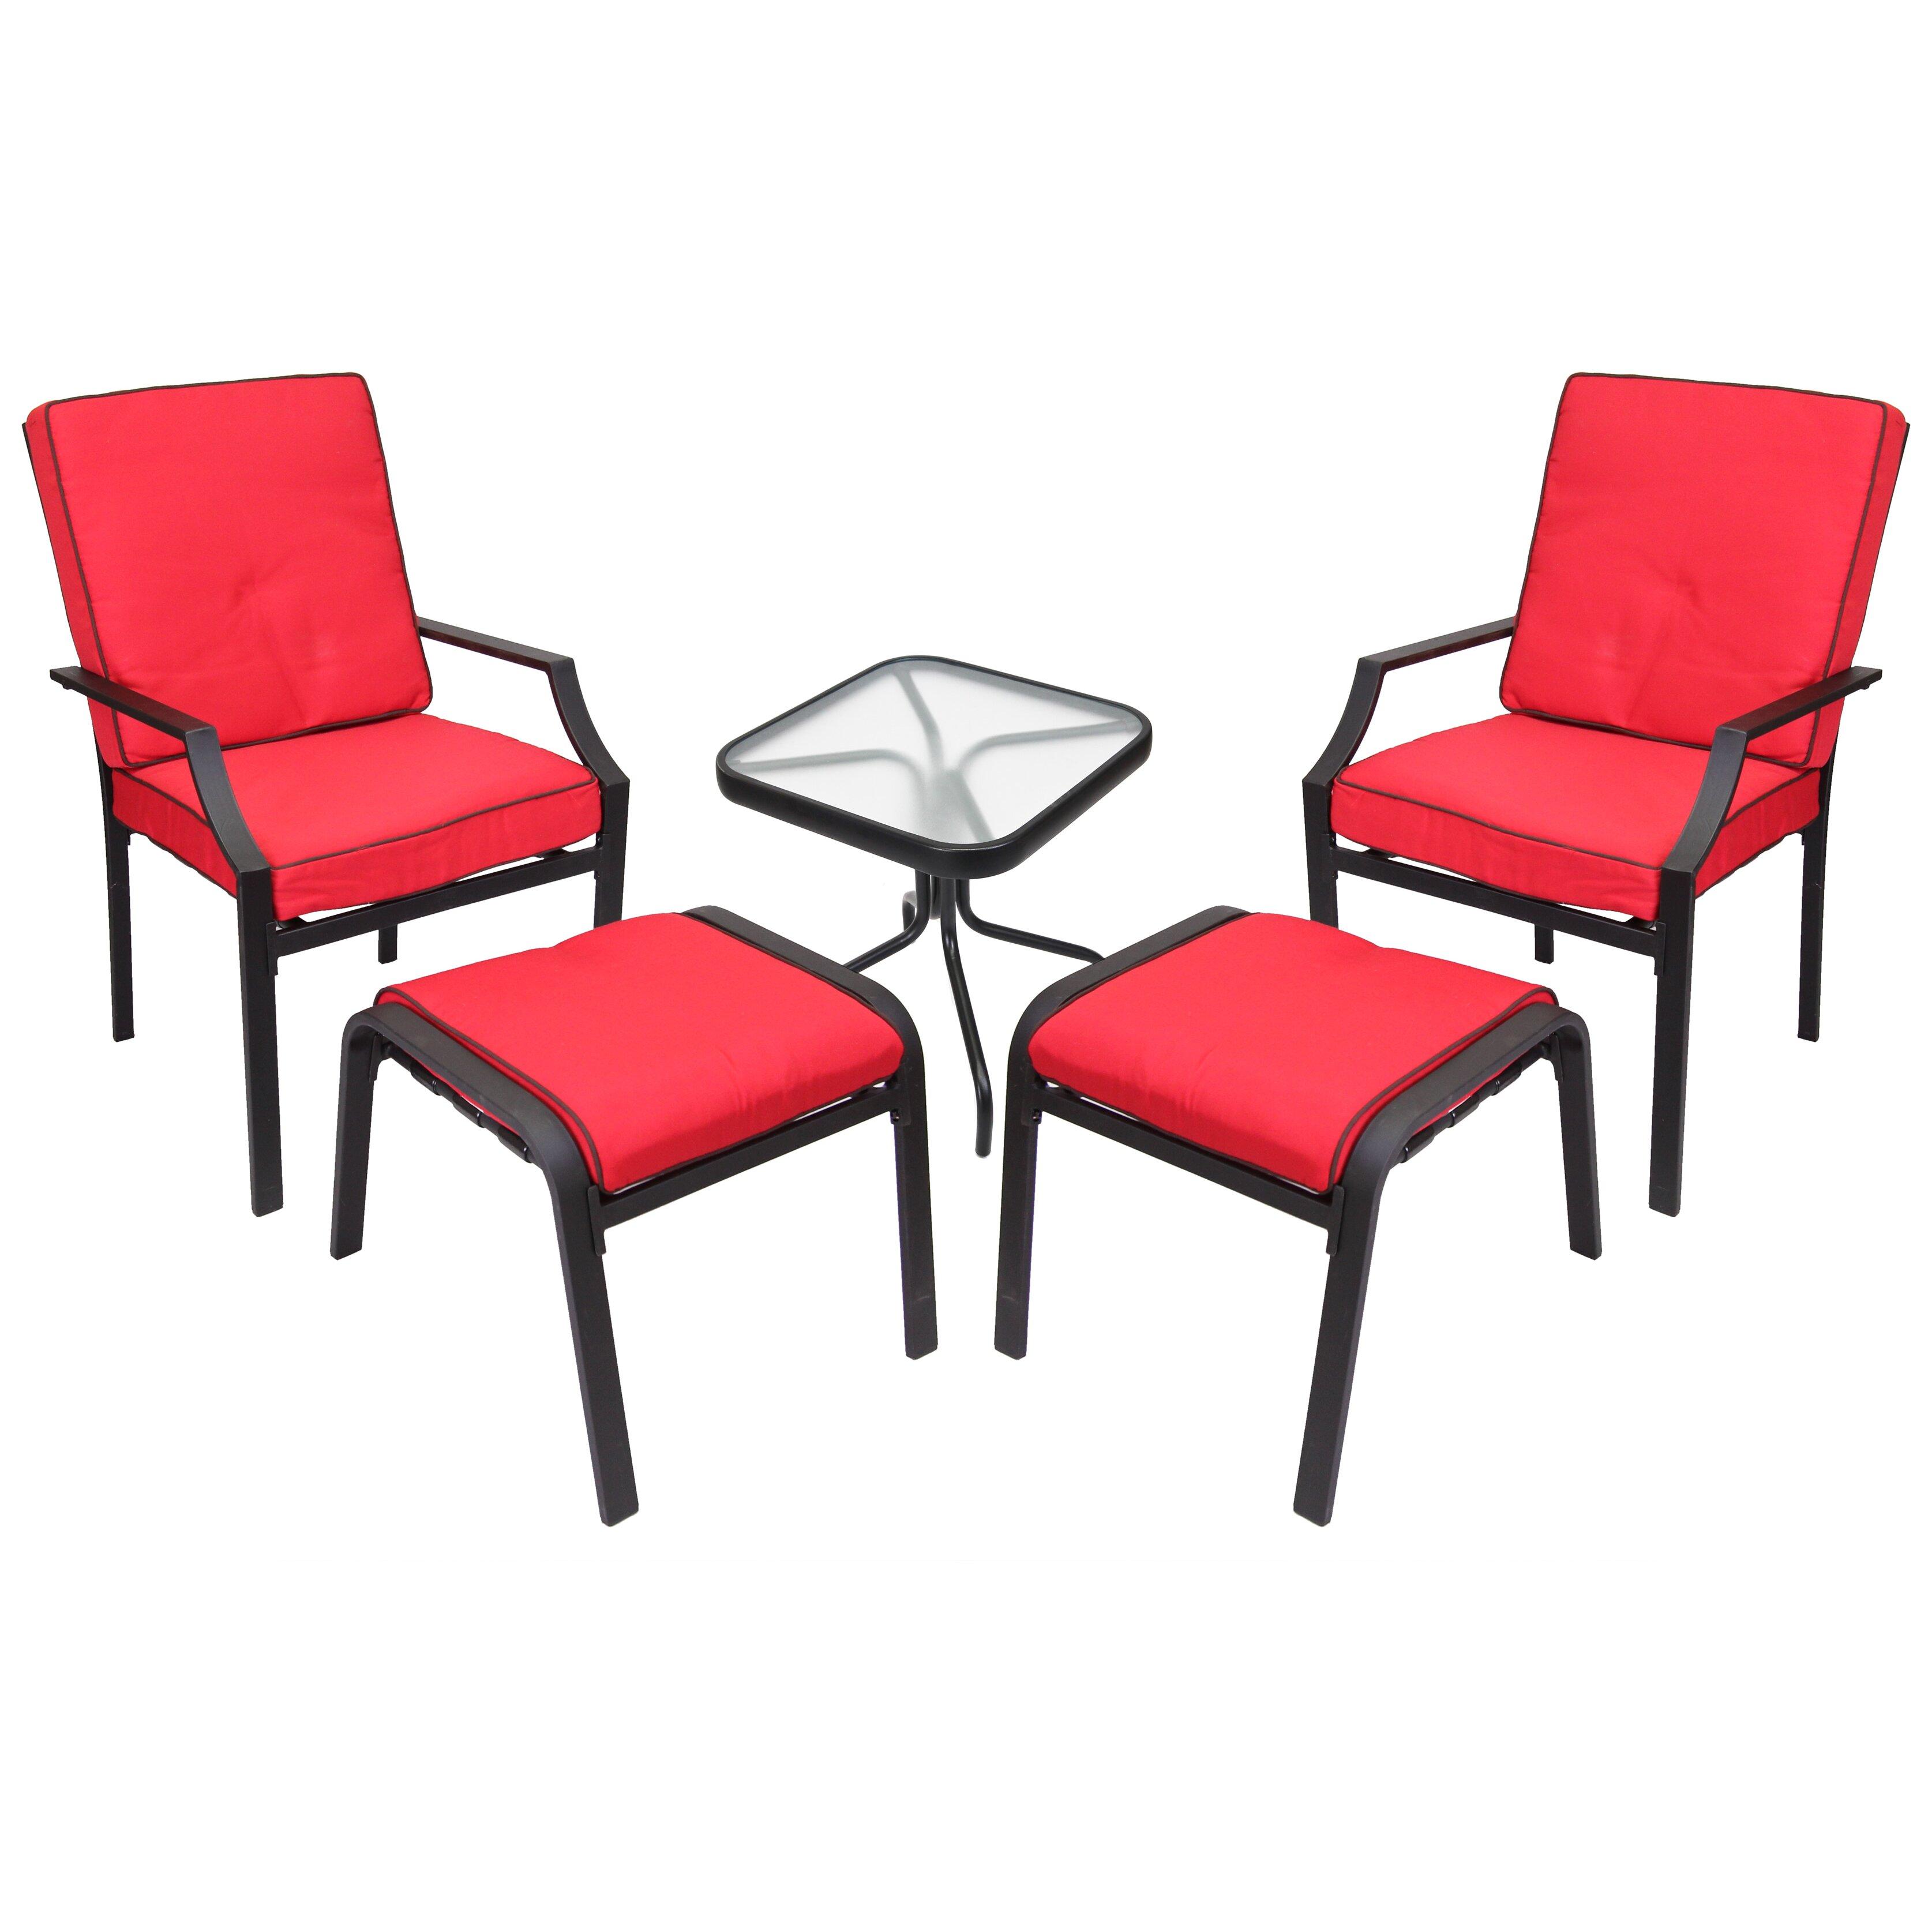 Jordan Manufacturing Sanoma 5 Piece Seating Group with